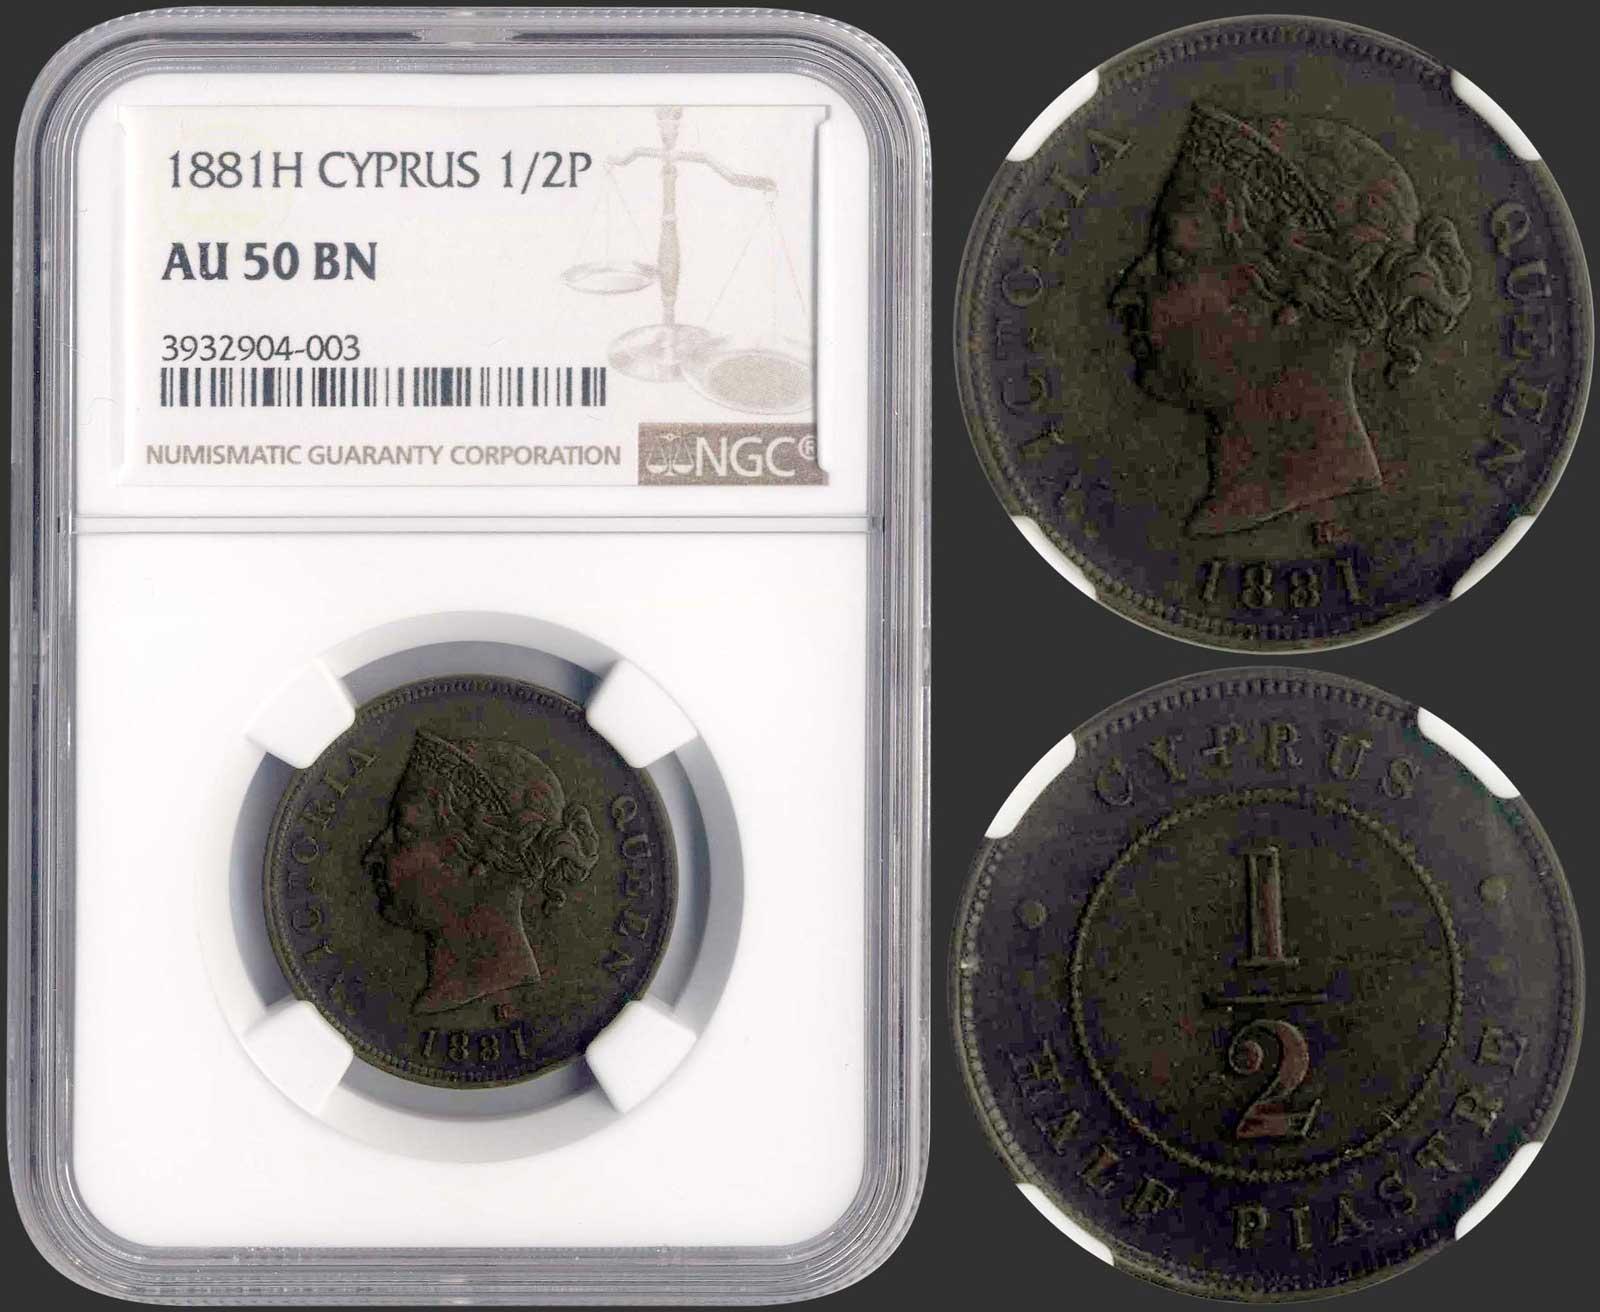 Lot 9181 - CYPRUS-  COINS & TOKENS C Y P R U S -  A. Karamitsos Public & LIVE Bid Auction 610 Coins, Medals & Banknotes